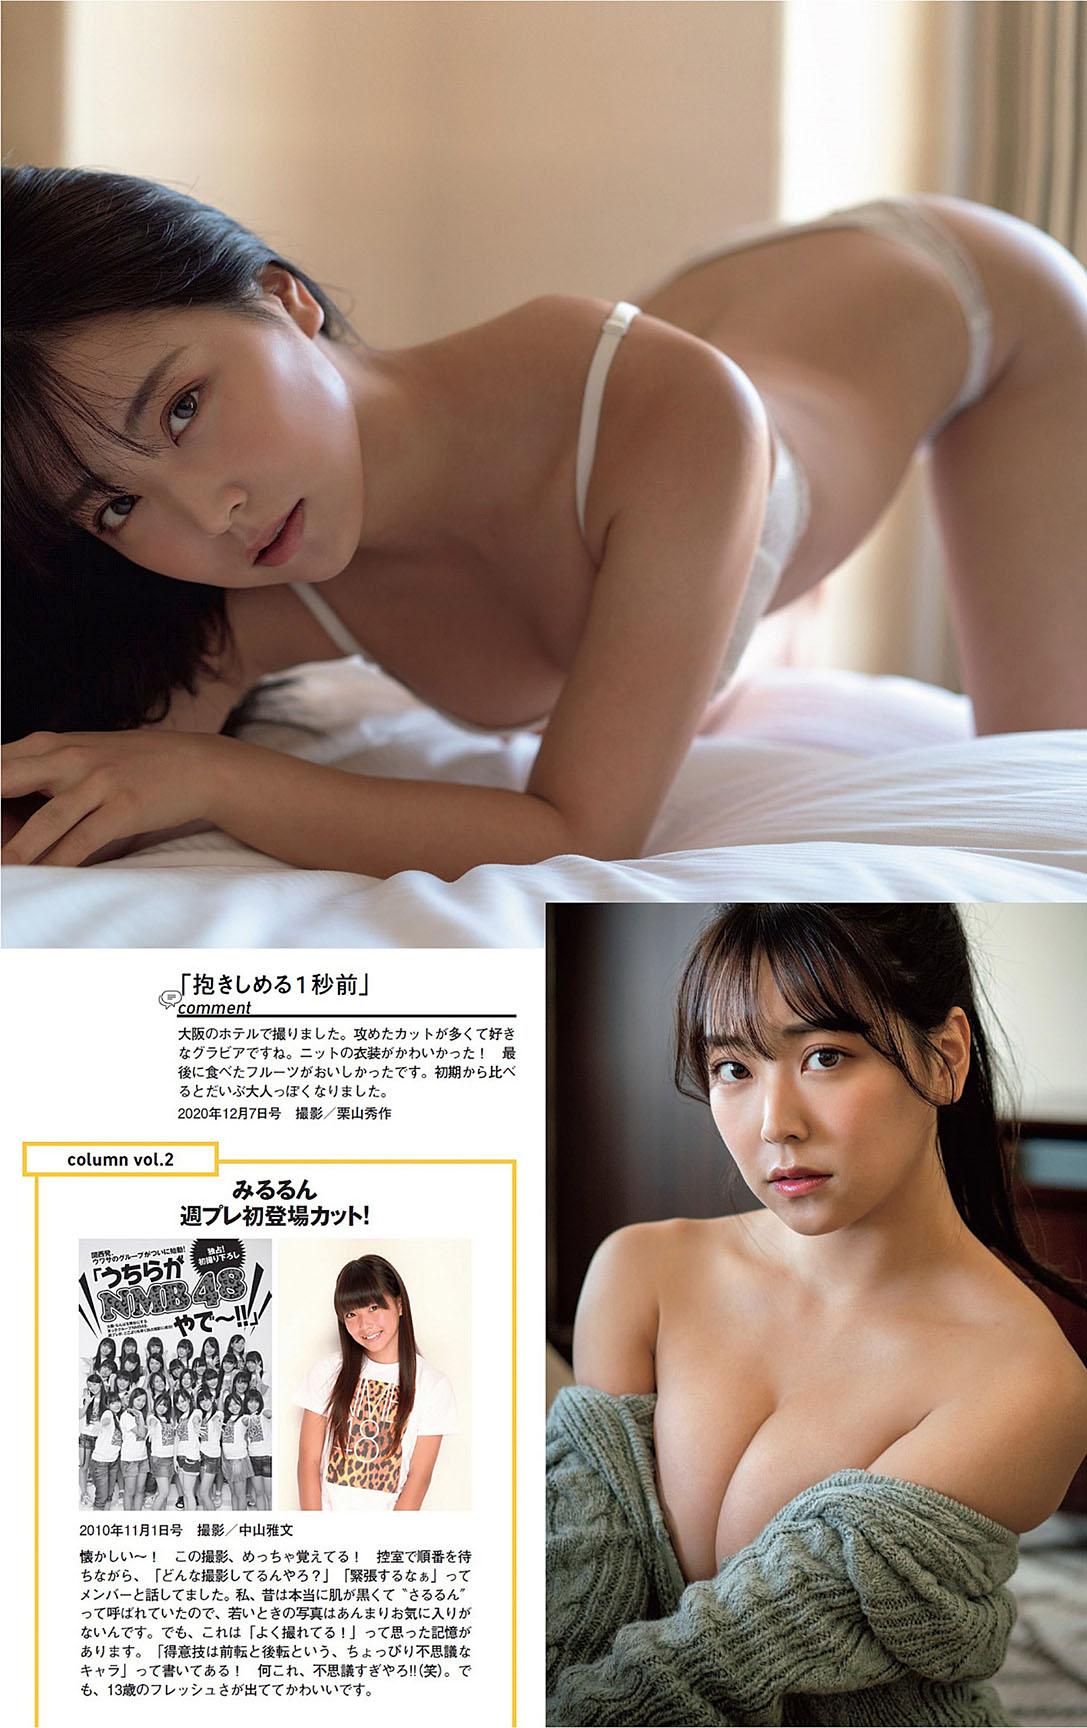 MShiroma WPB 210705 15.jpg